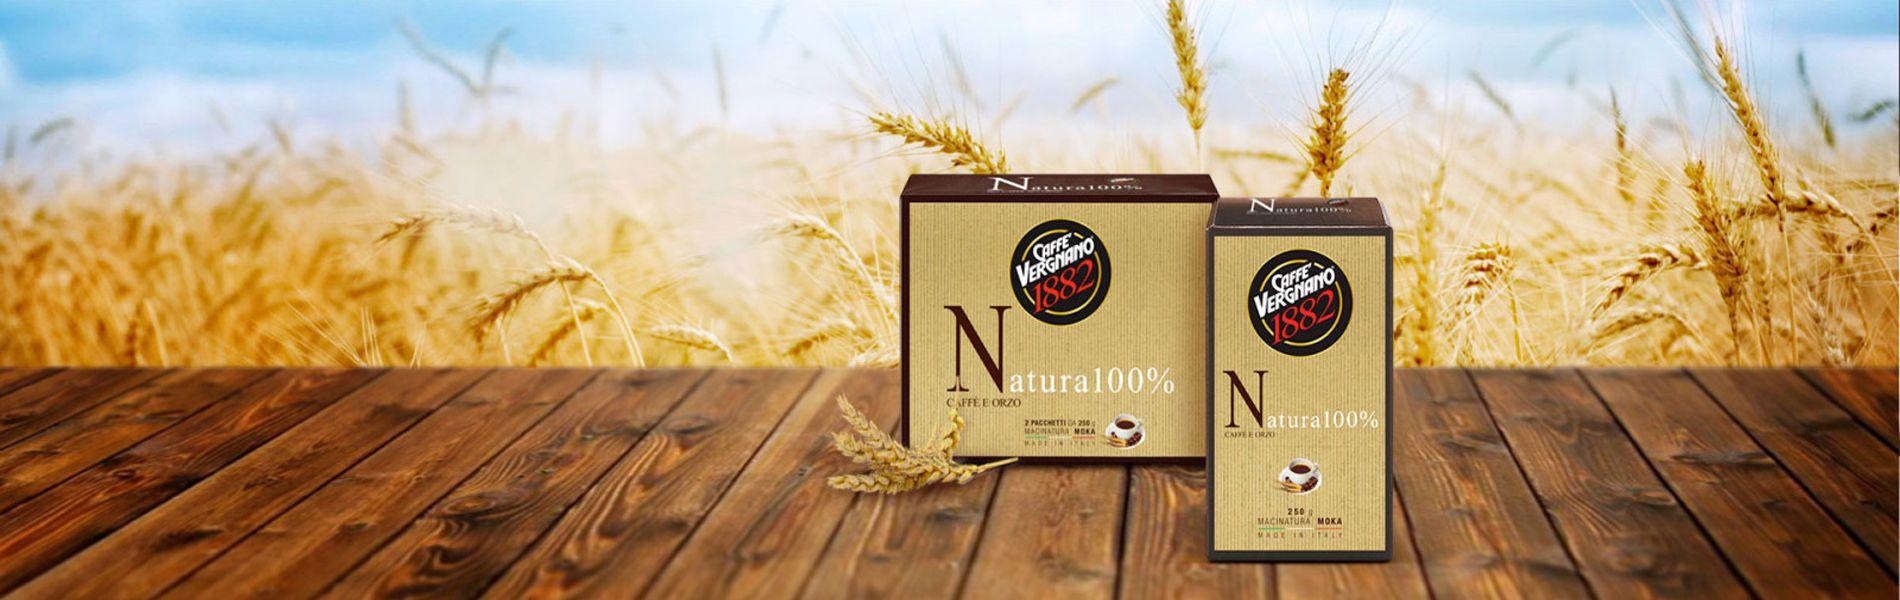 natura100 xl